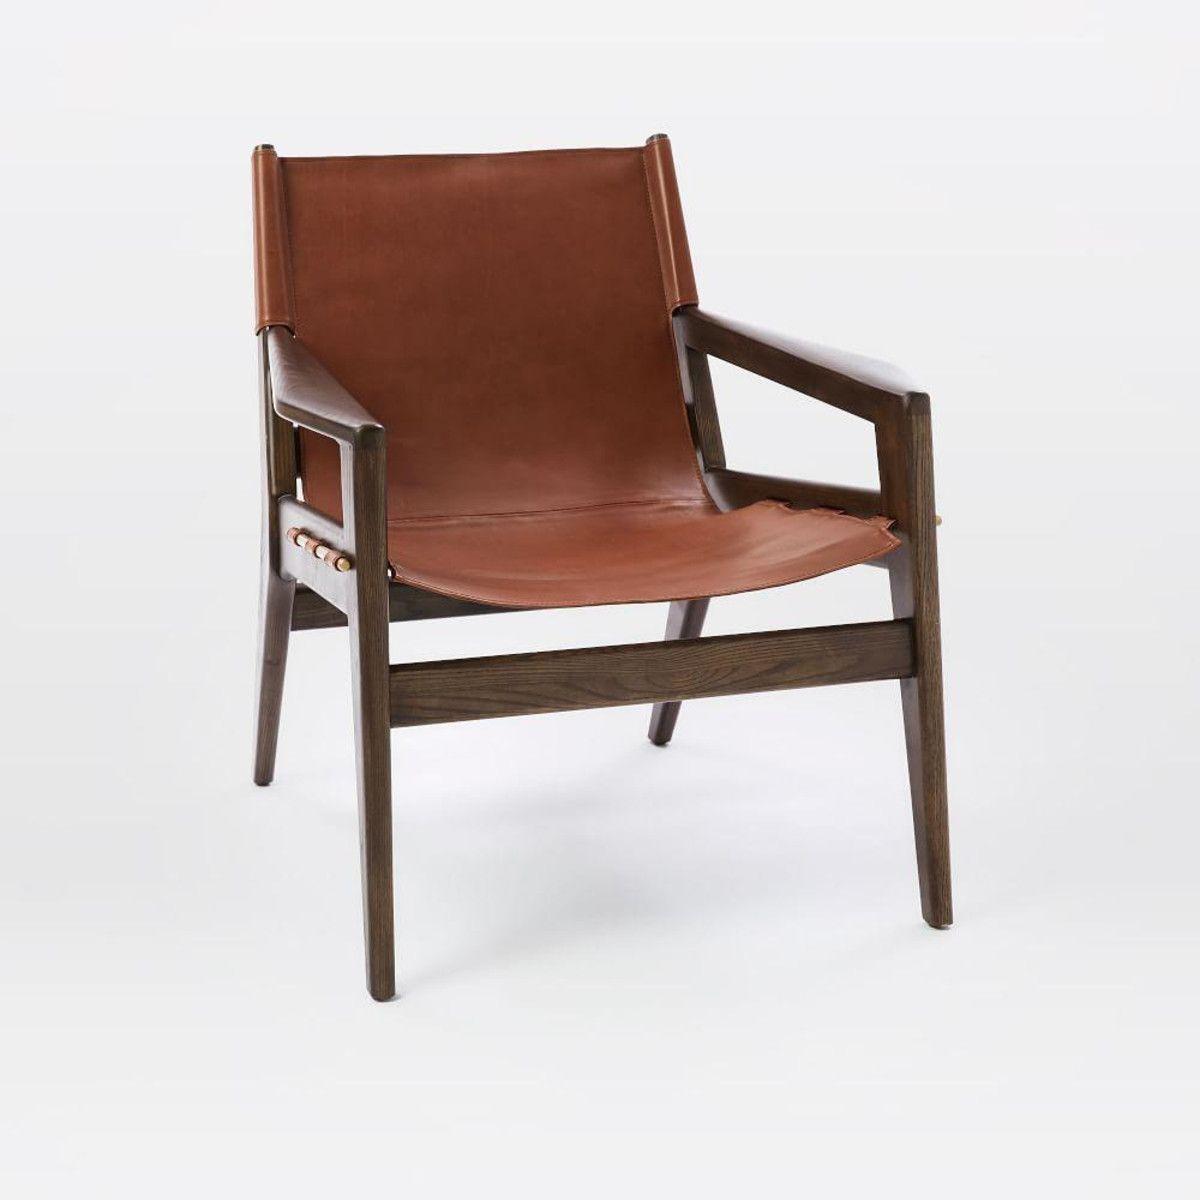 Felipe Leather Sling Chair West Elm $1400